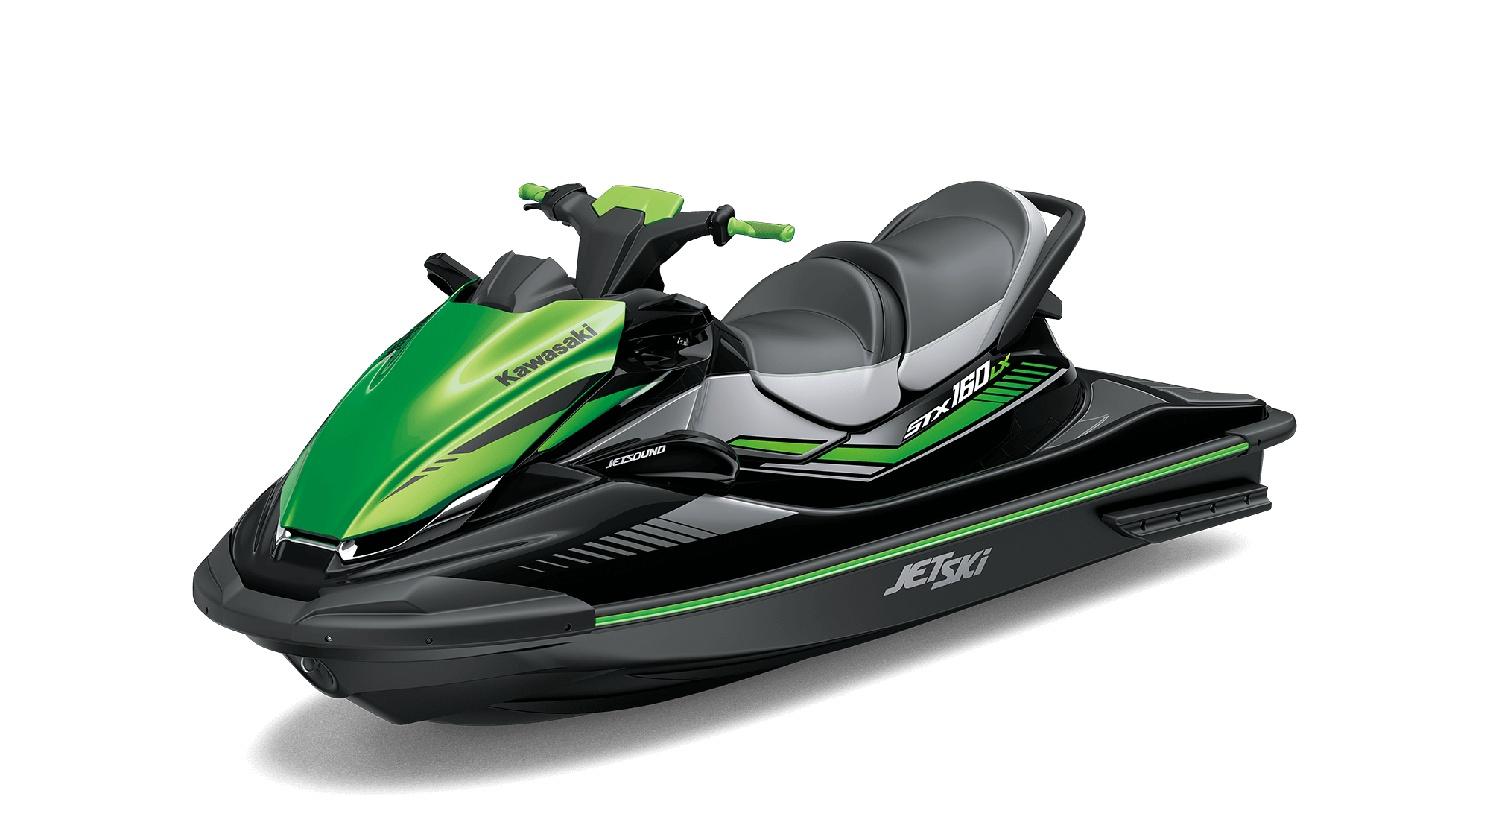 Kawasaki JET SKI STX 160LX Ébène / Vert Lime Bonbon 2021